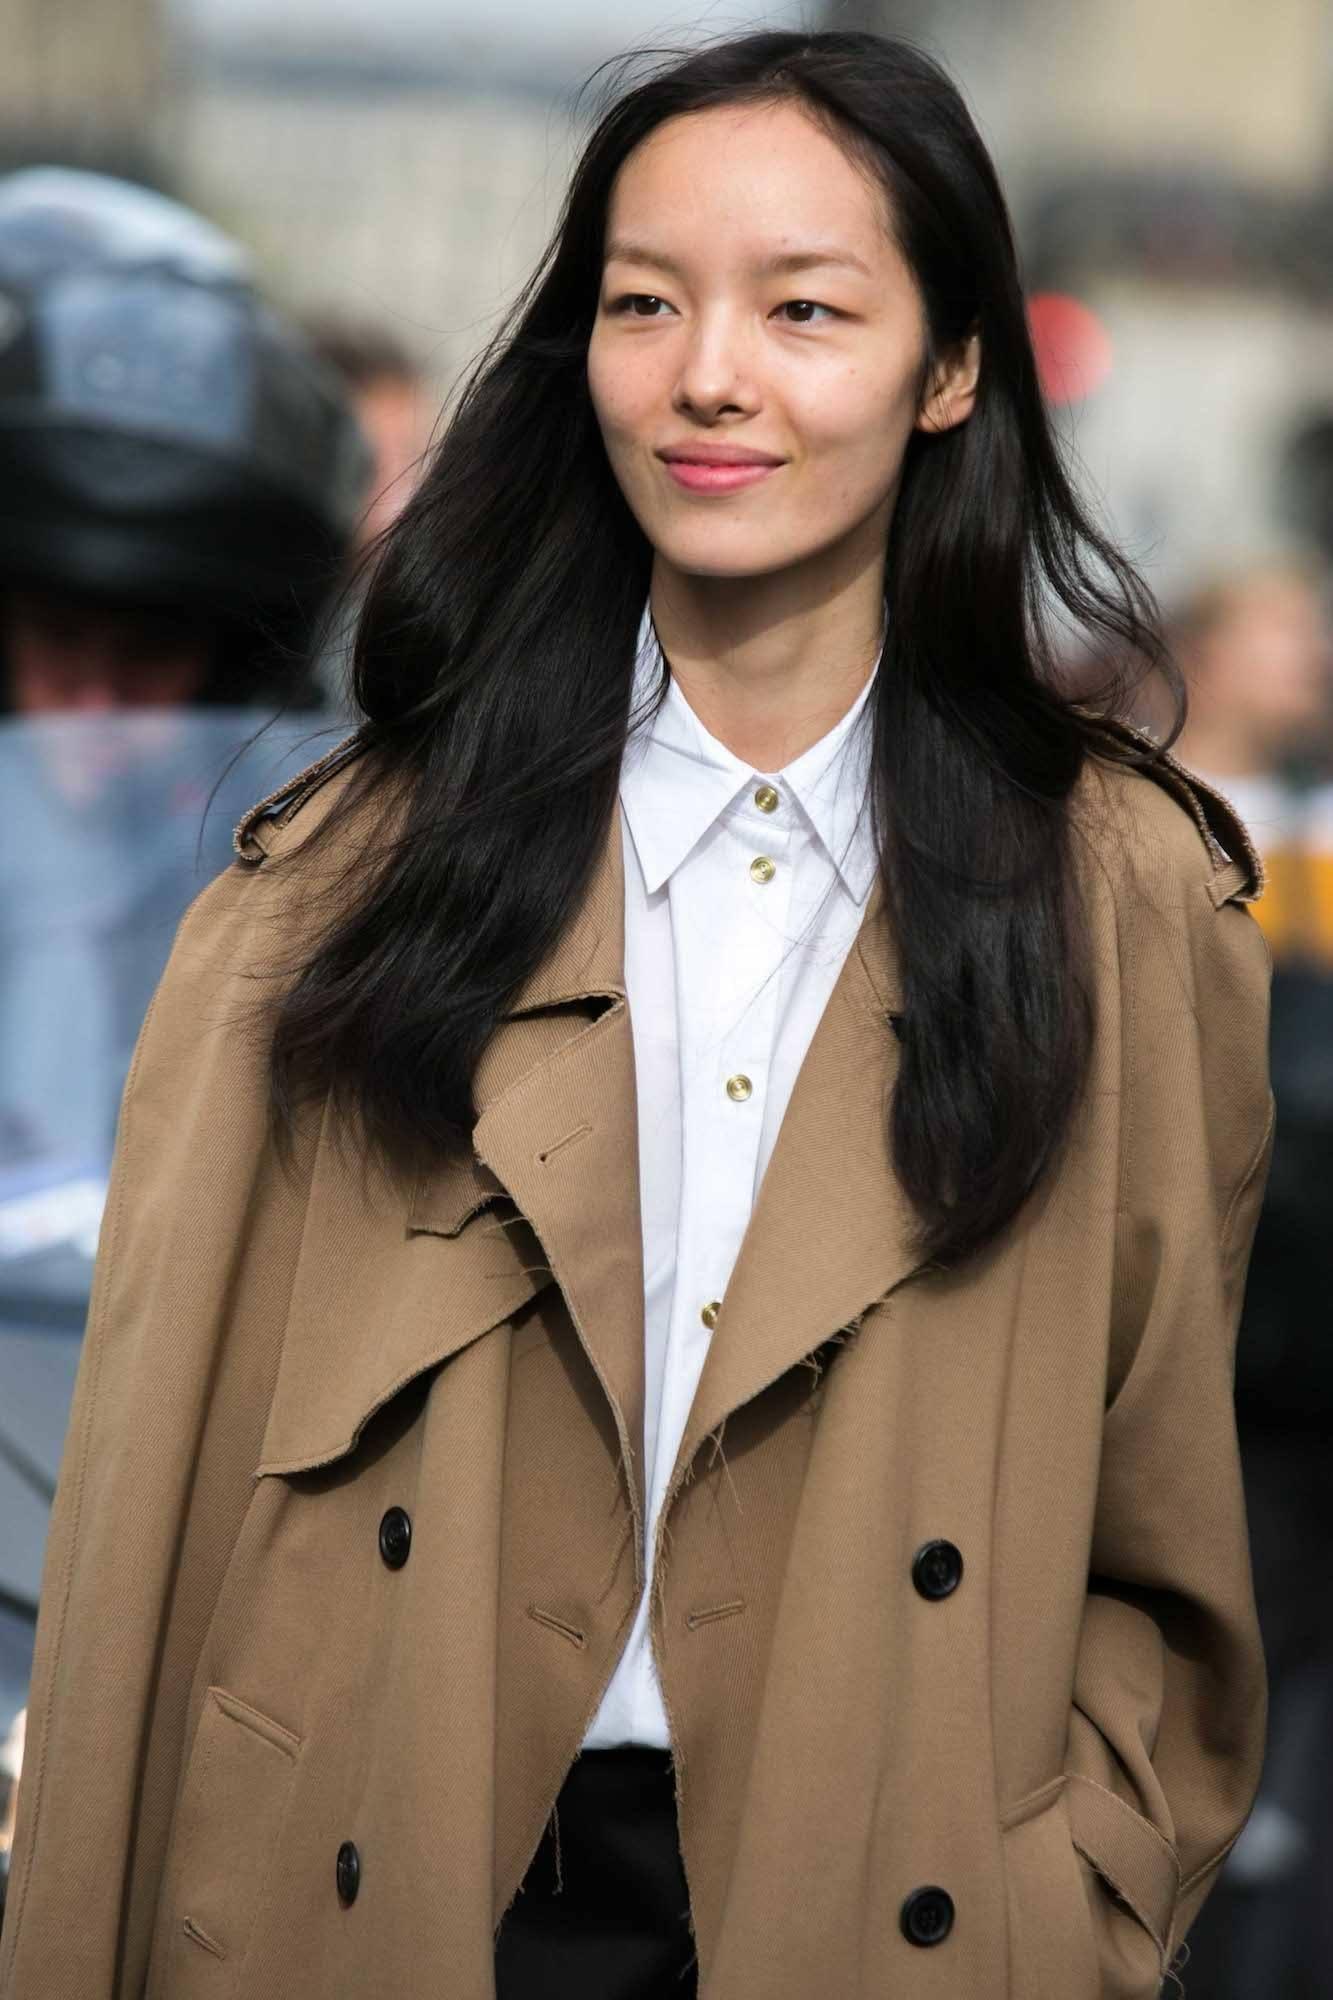 Rambut hitam panjang warna hitam dan model rambut lurus.